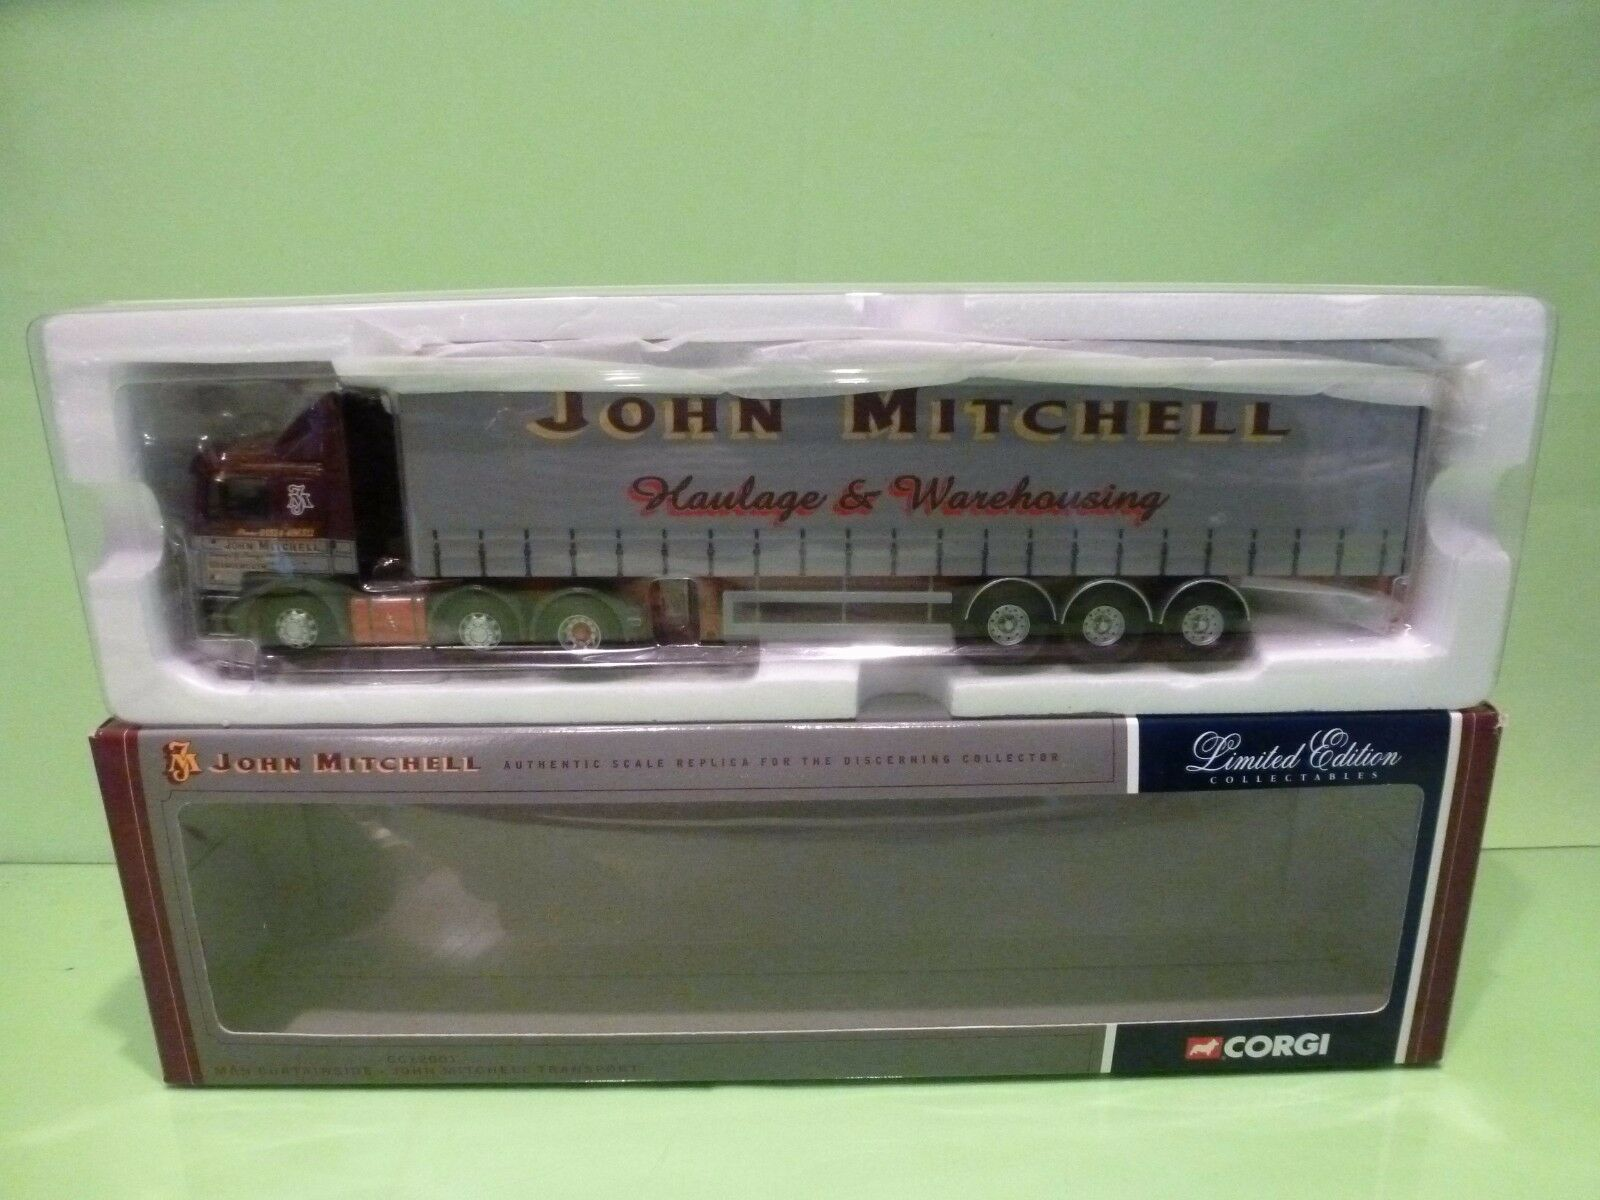 CORGI TOYS MAN CURTAINSIDE - JOHN MITCHELL TRANSPORT - 1 50 - EXCELLENT  IN BOX